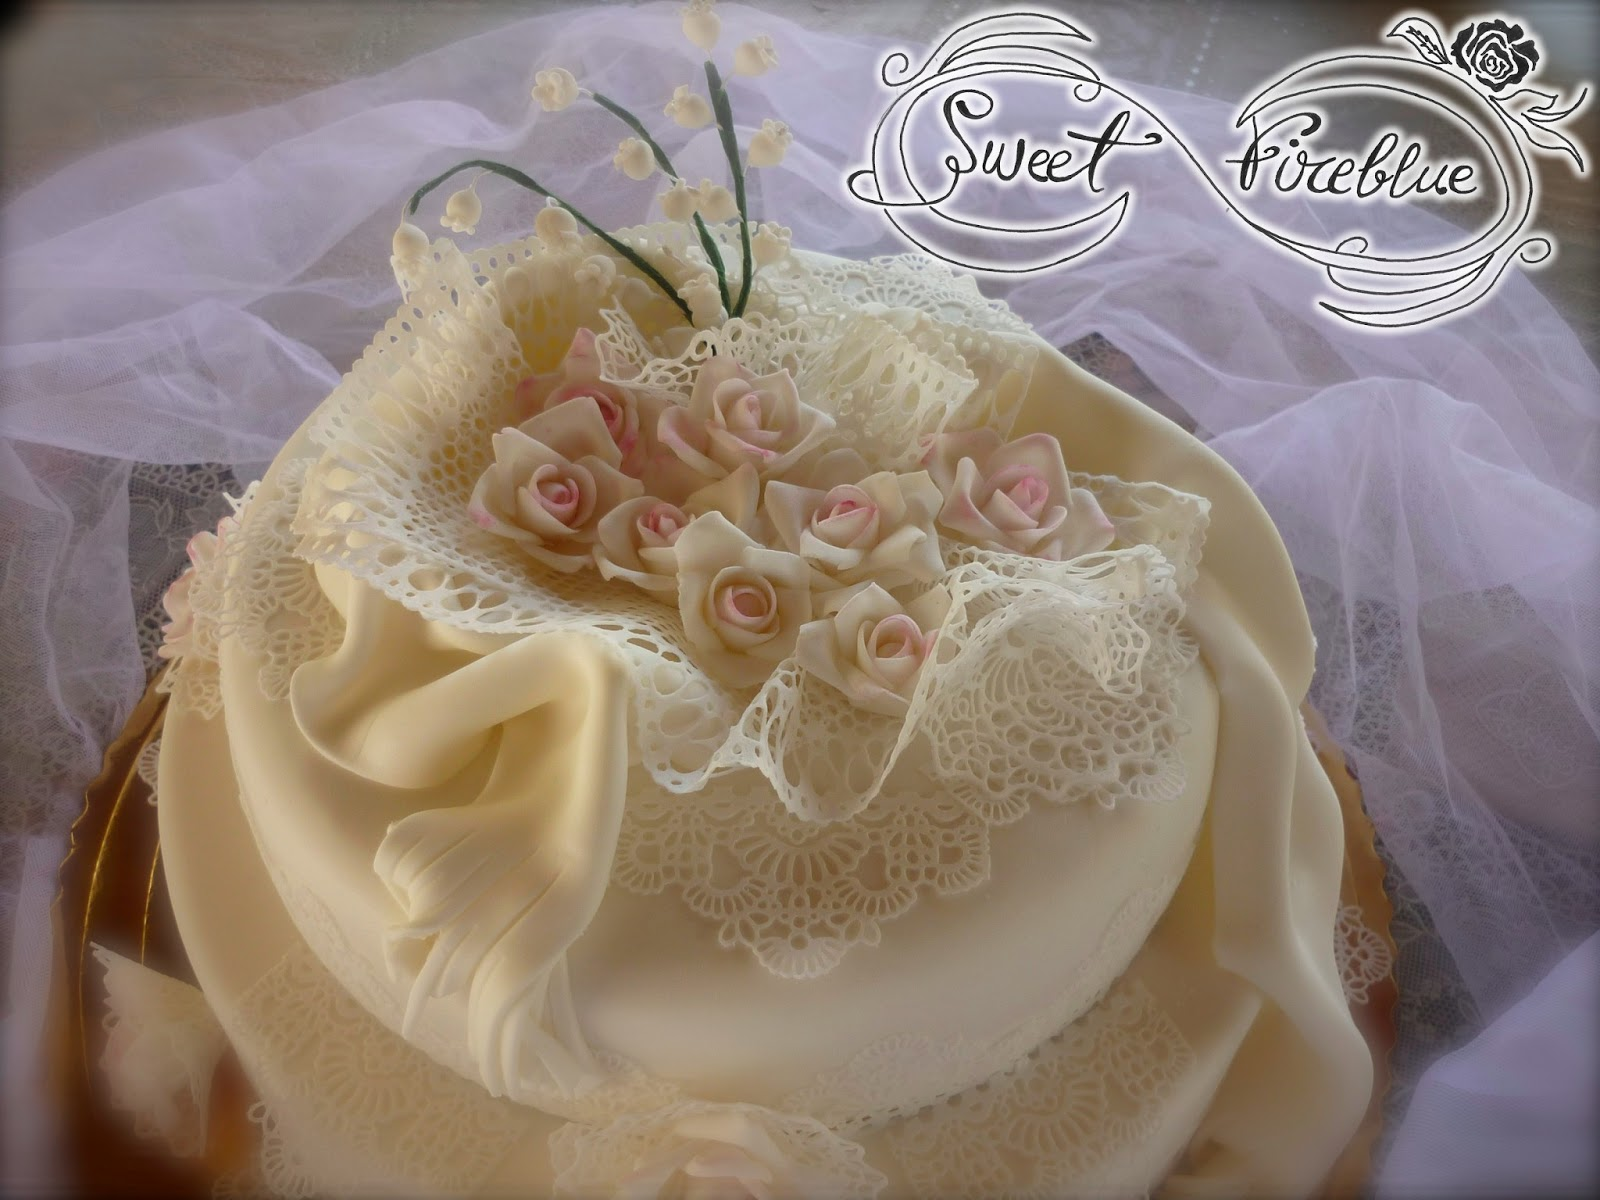 Tantissimi Auguri Matrimonio : Sweet fireblue torta ° di matrimonio